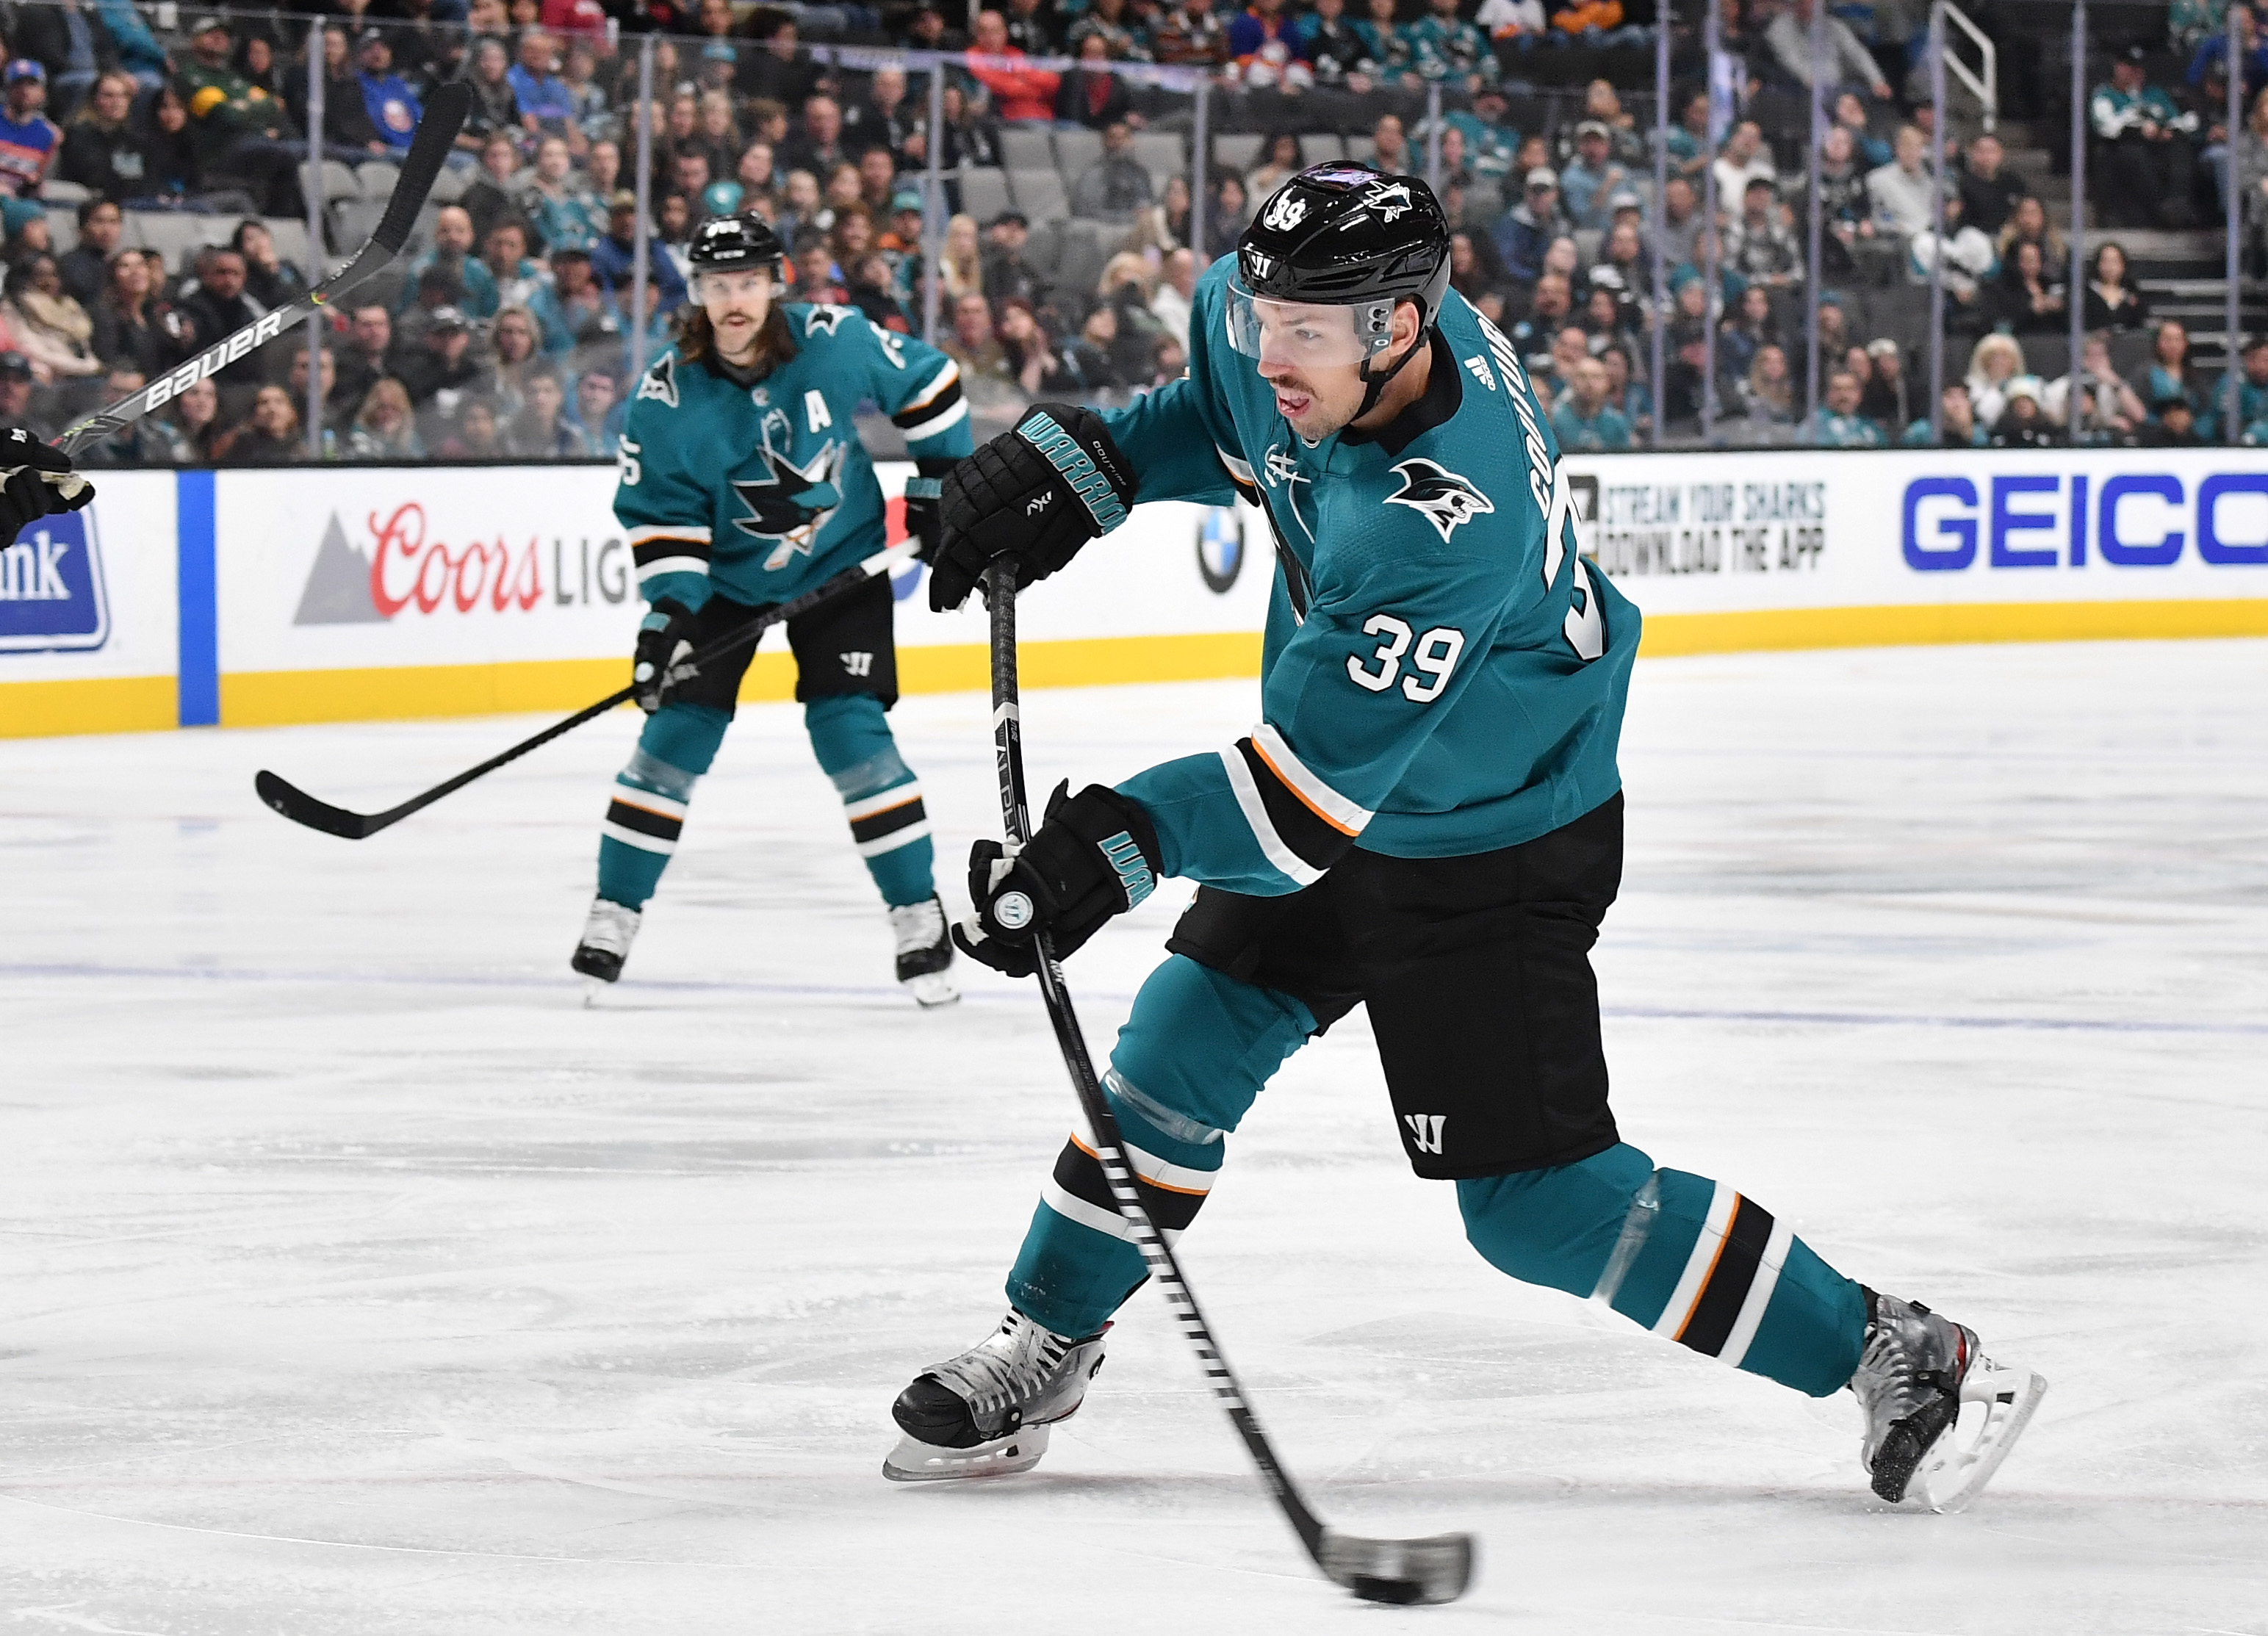 SAN JOSE, CA - NOVEMBER 23: Logan Couture #39 of the San Jose Sharks shoots the puck against the New York Islanders at SAP Center on November 23, 2019 in San Jose, California.